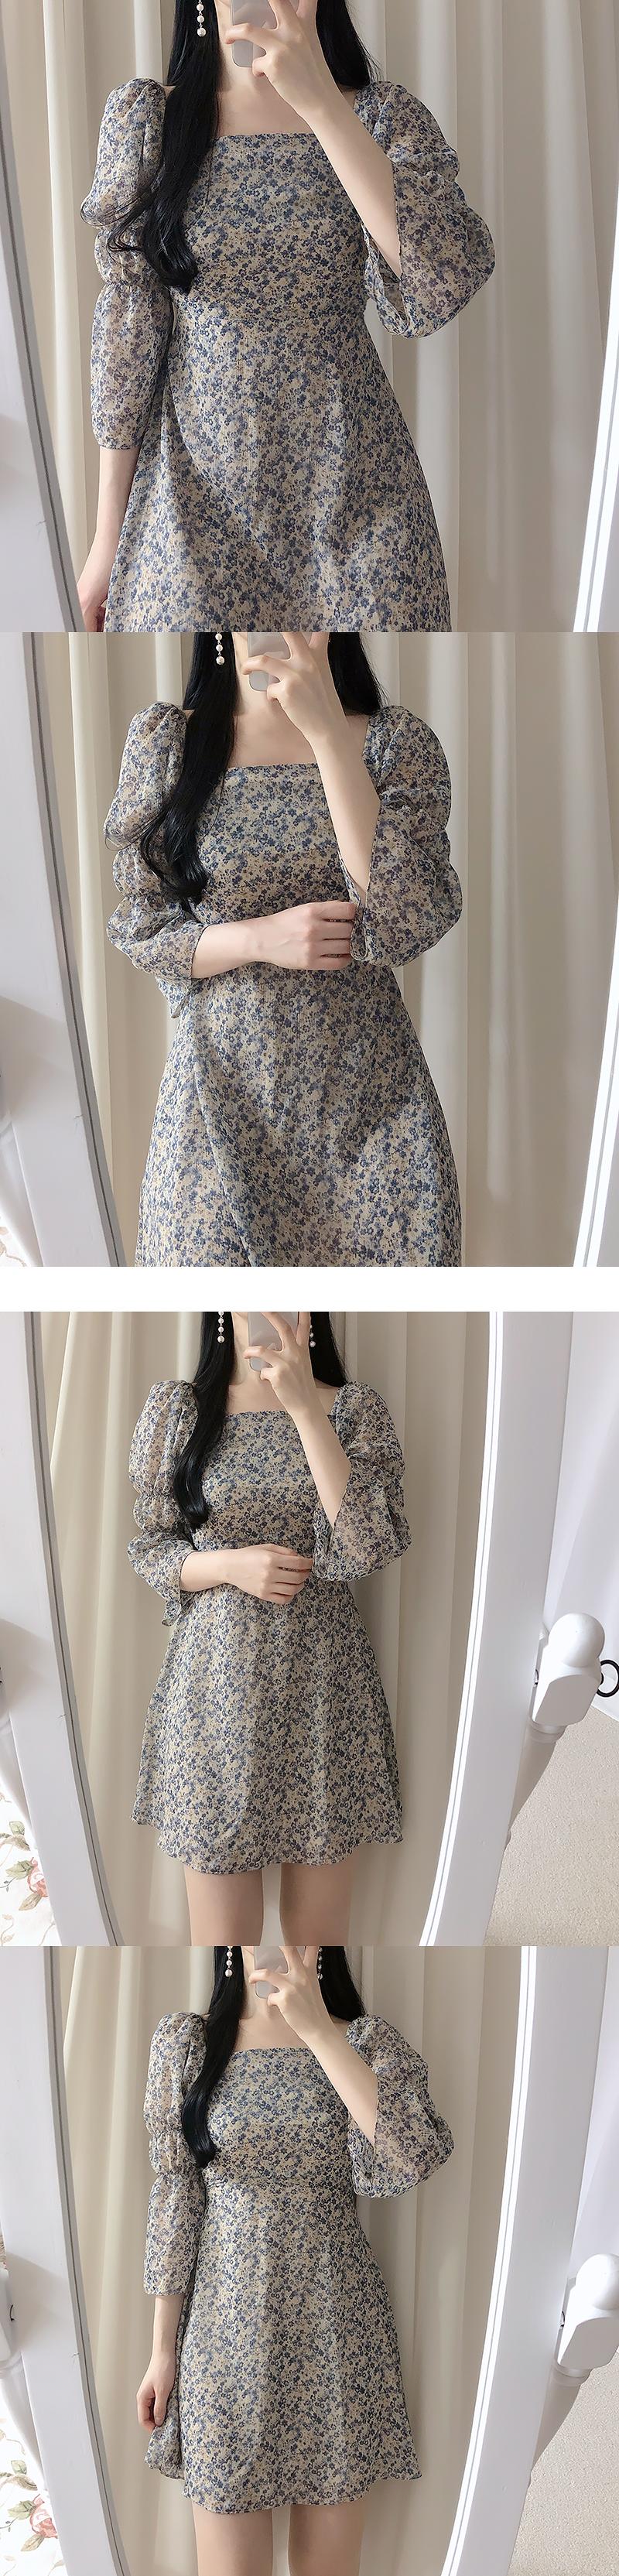 Mir Flower Shoulder Dress